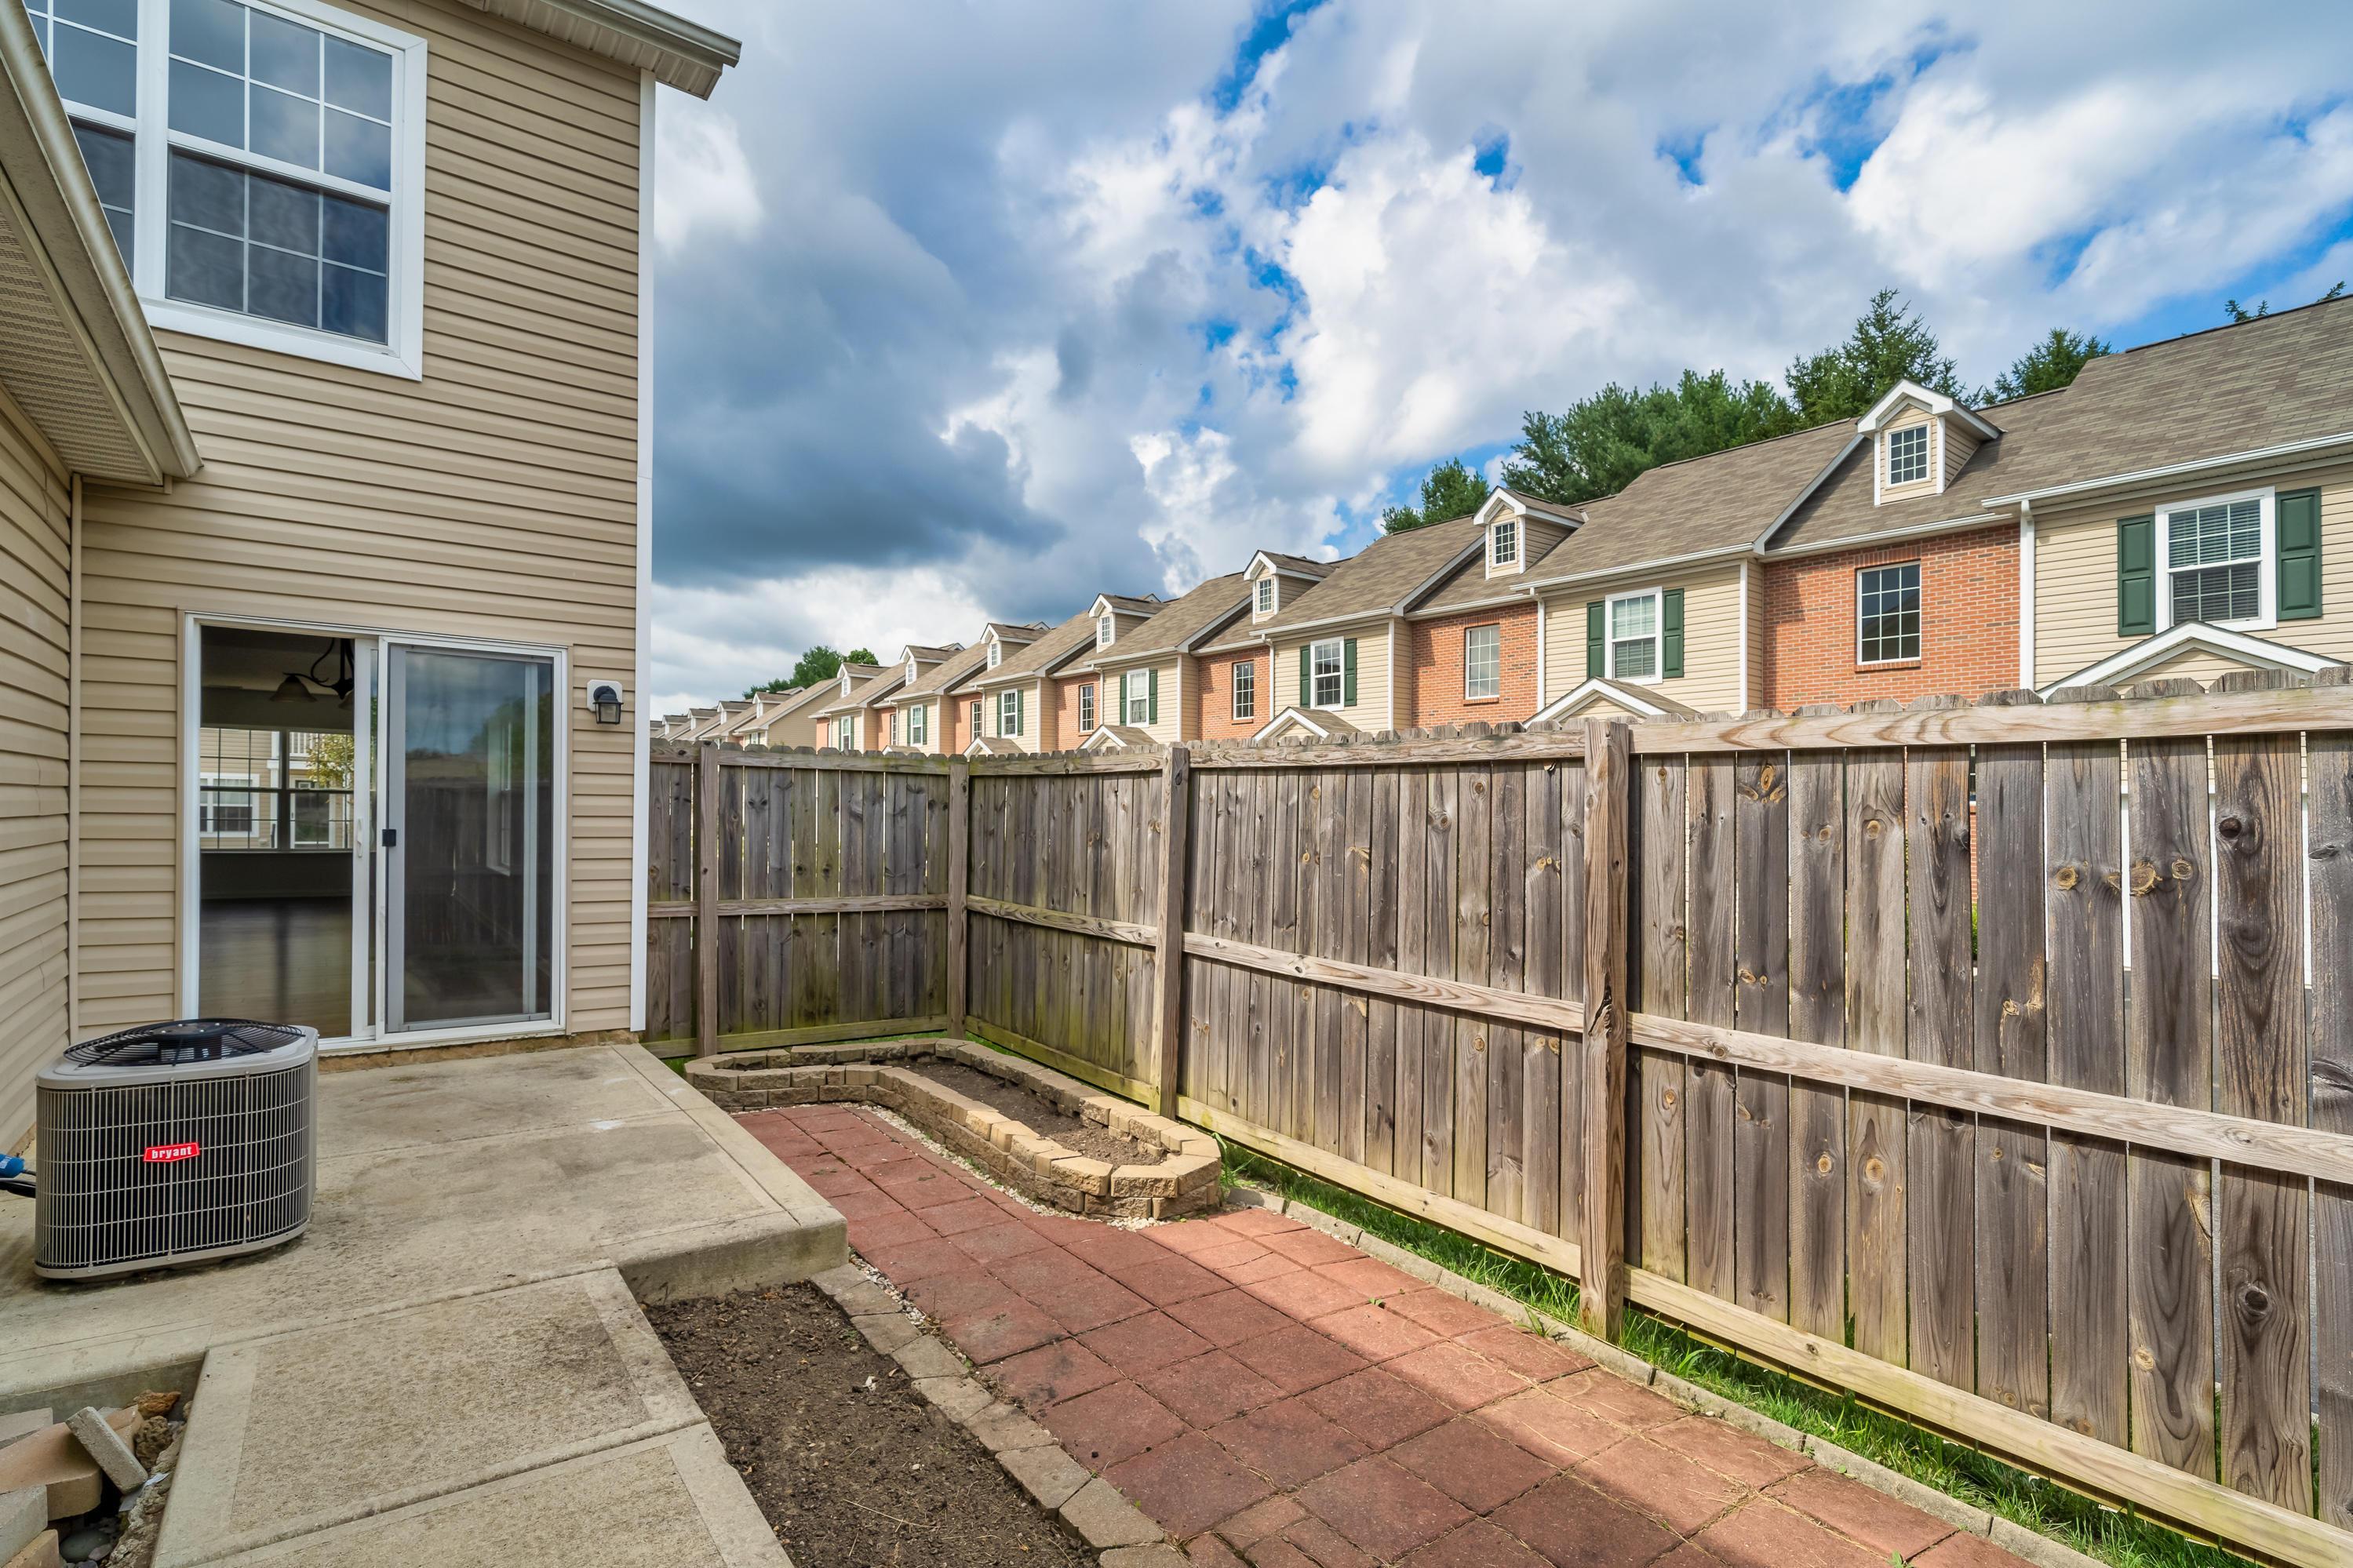 120 Gifford Road, Columbus, Ohio 43235, 2 Bedrooms Bedrooms, ,3 BathroomsBathrooms,Residential,For Sale,Gifford,220025397